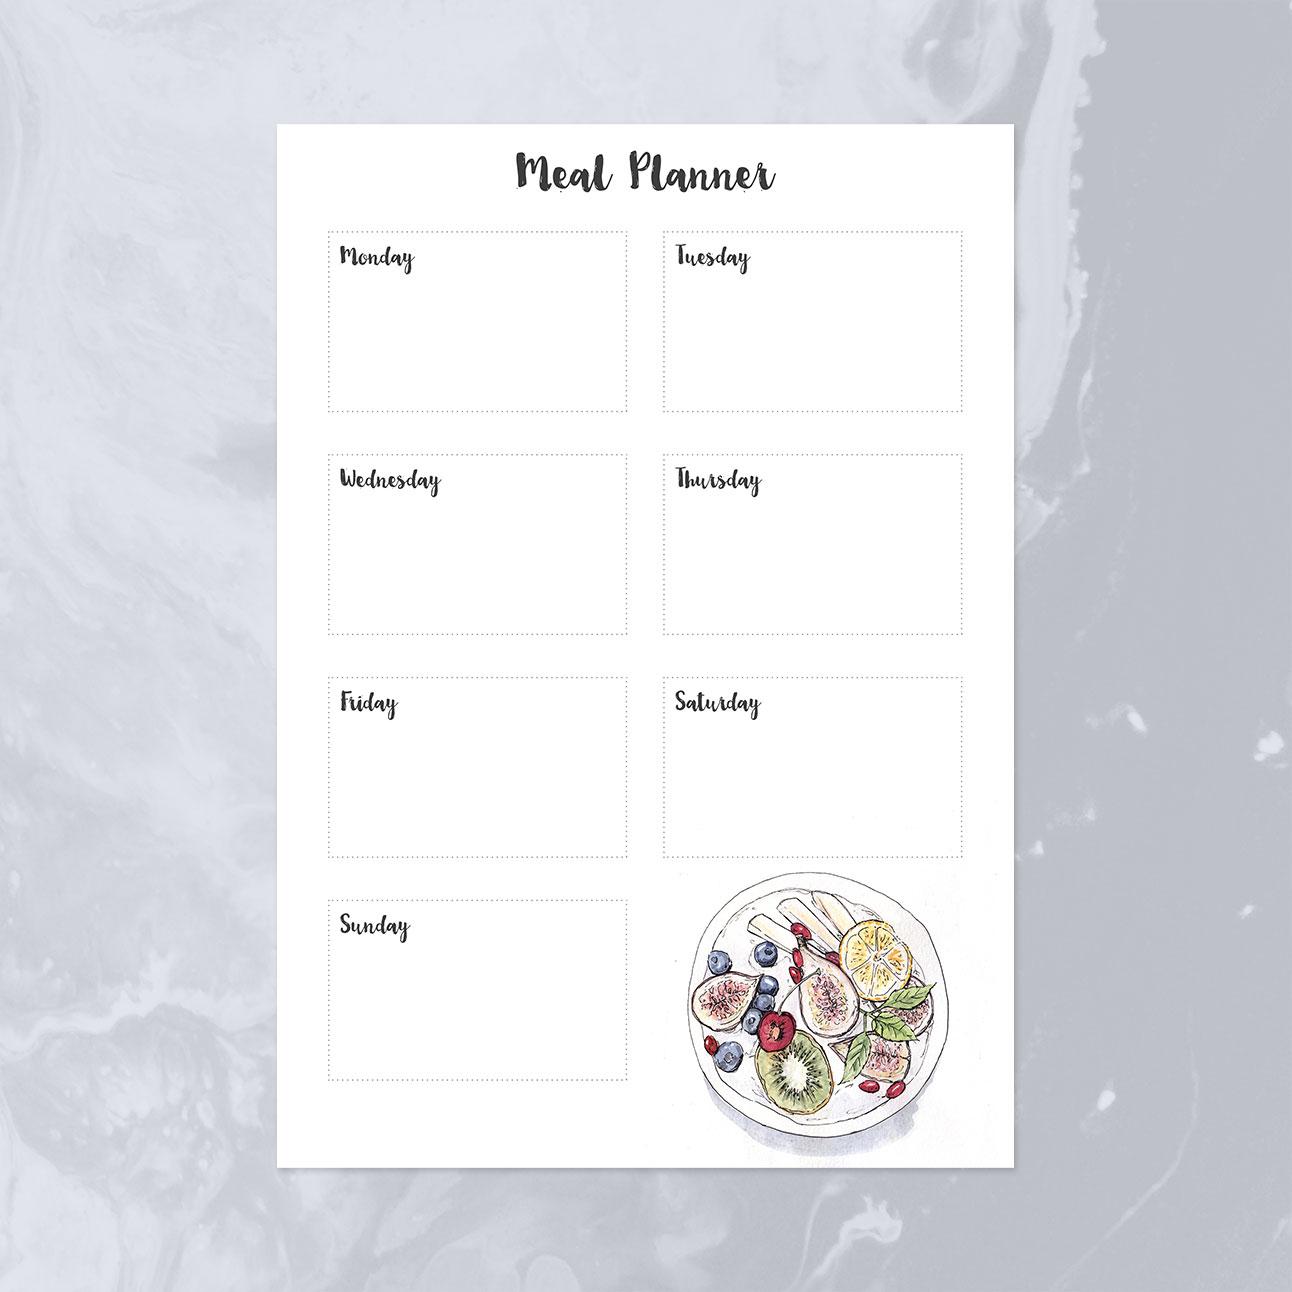 planning-printables-meal-planner.jpg